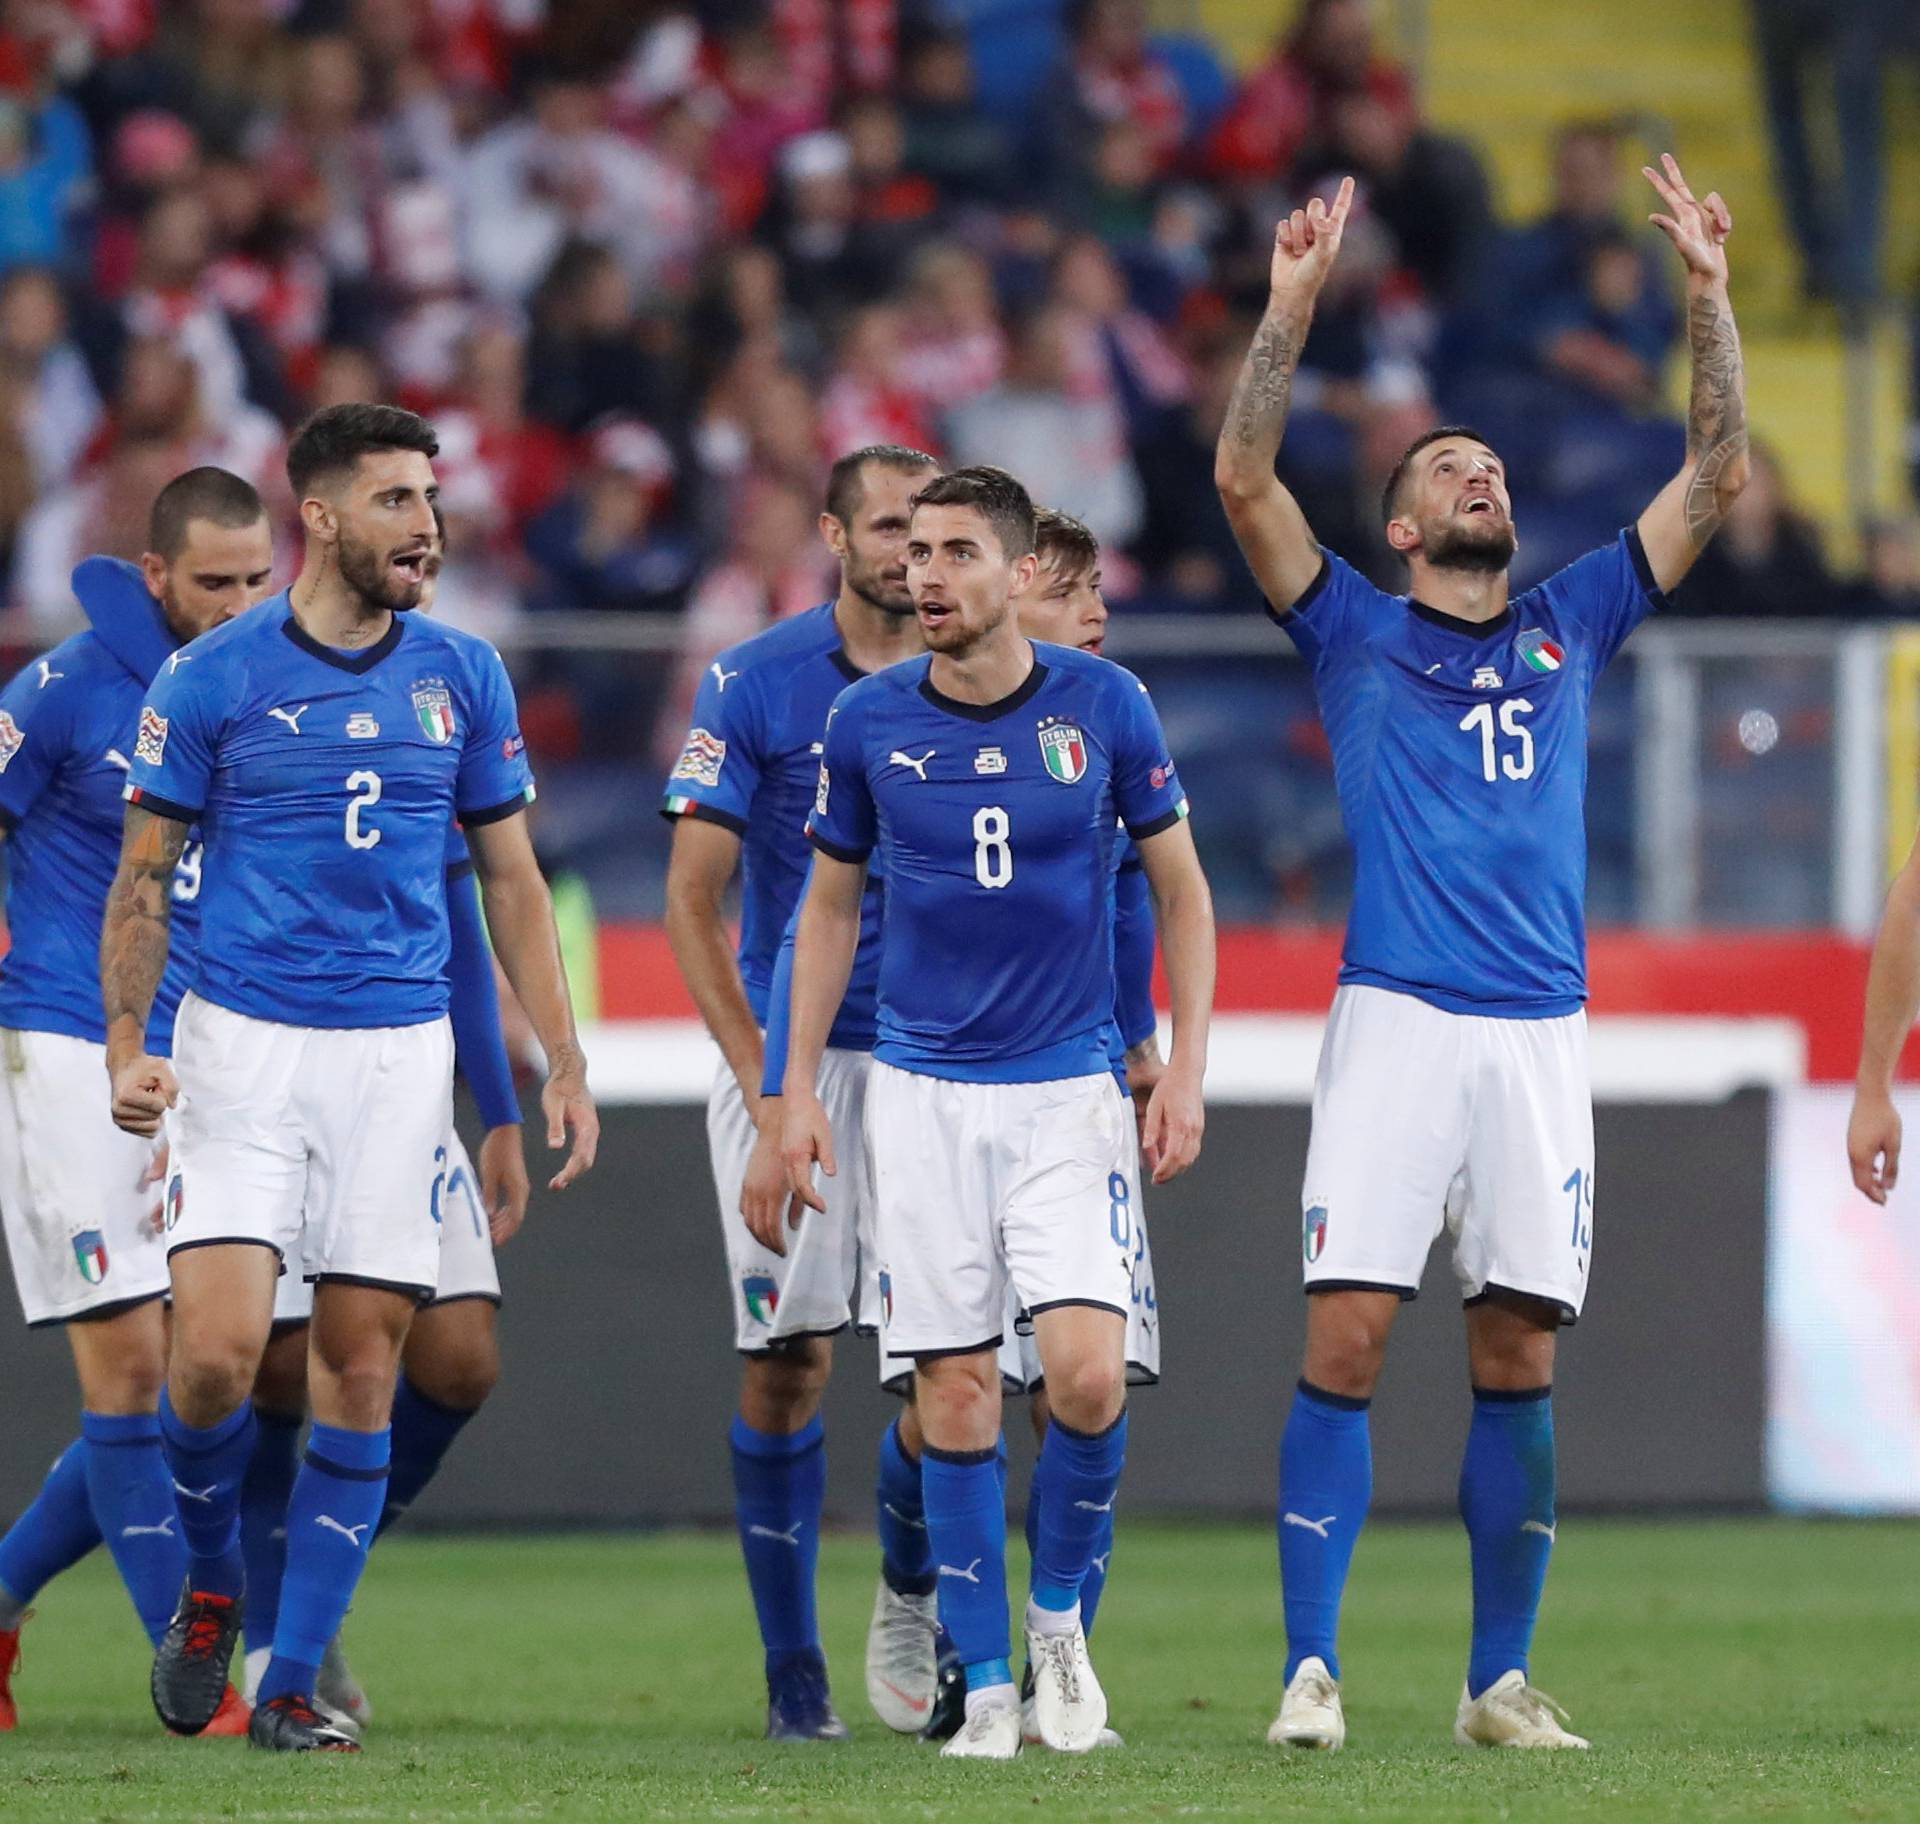 UEFA Nations League - League A - Group 3 - Poland v Italy